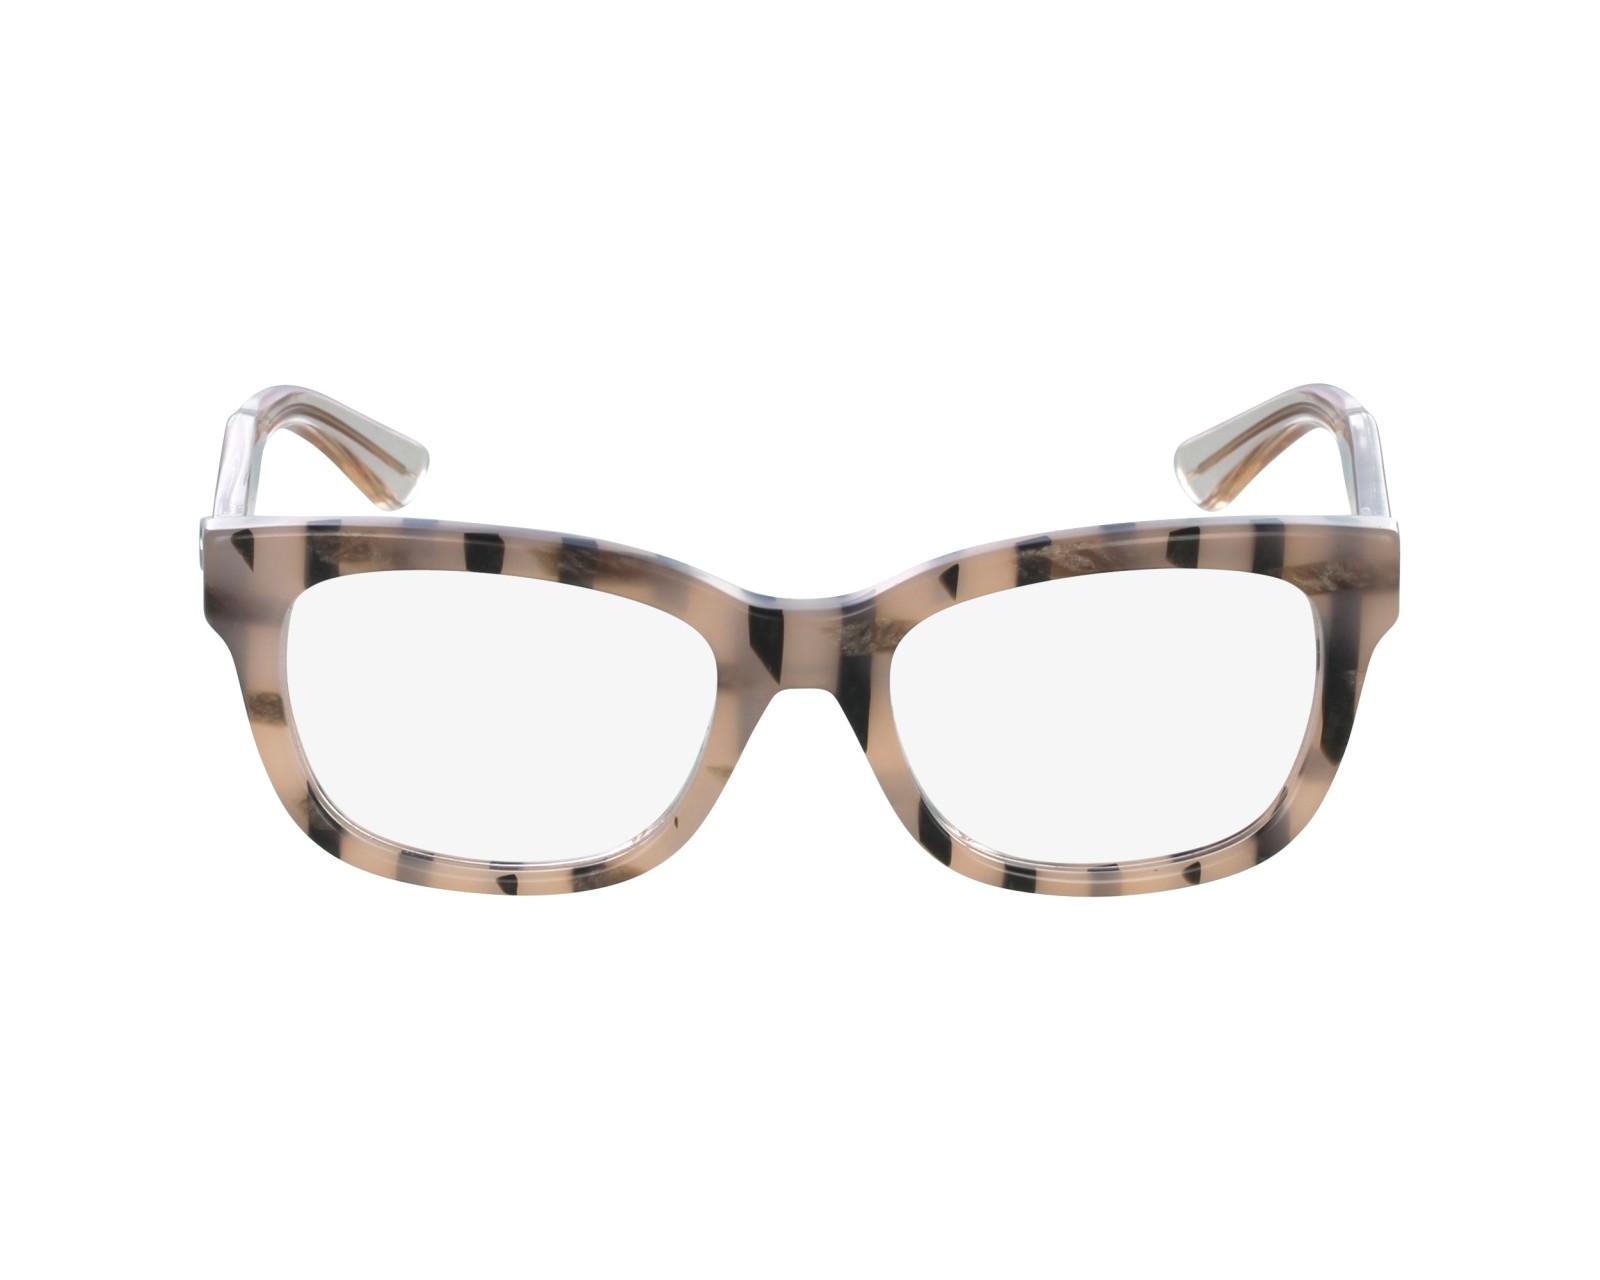 gucci eyeglass frames. eyeglasses gucci - gg 3750 yv1 eyeglass frames